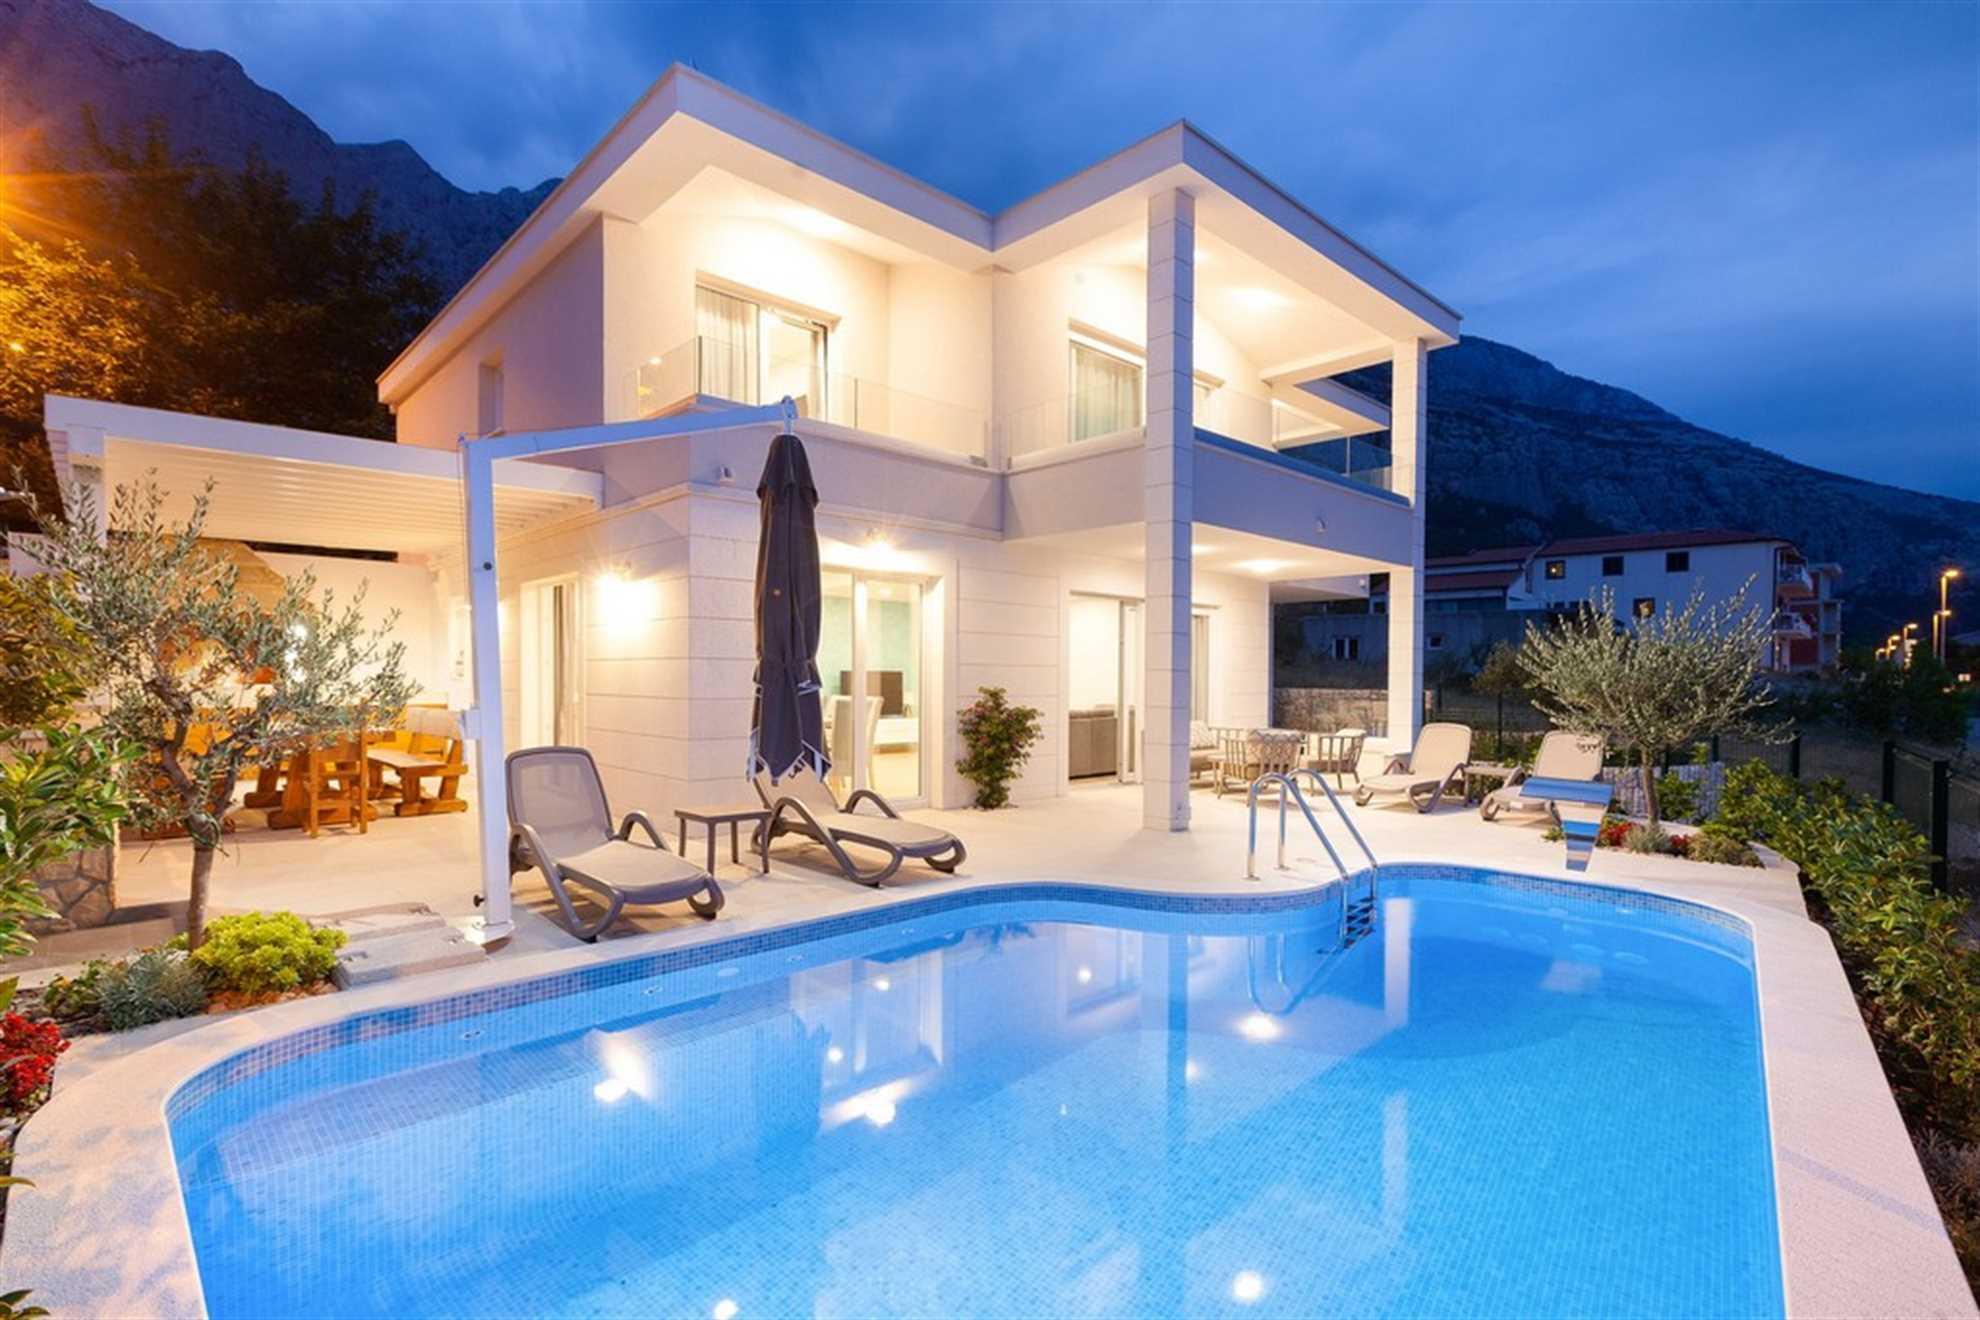 Luxury Villa Moonlight with Heated Pool